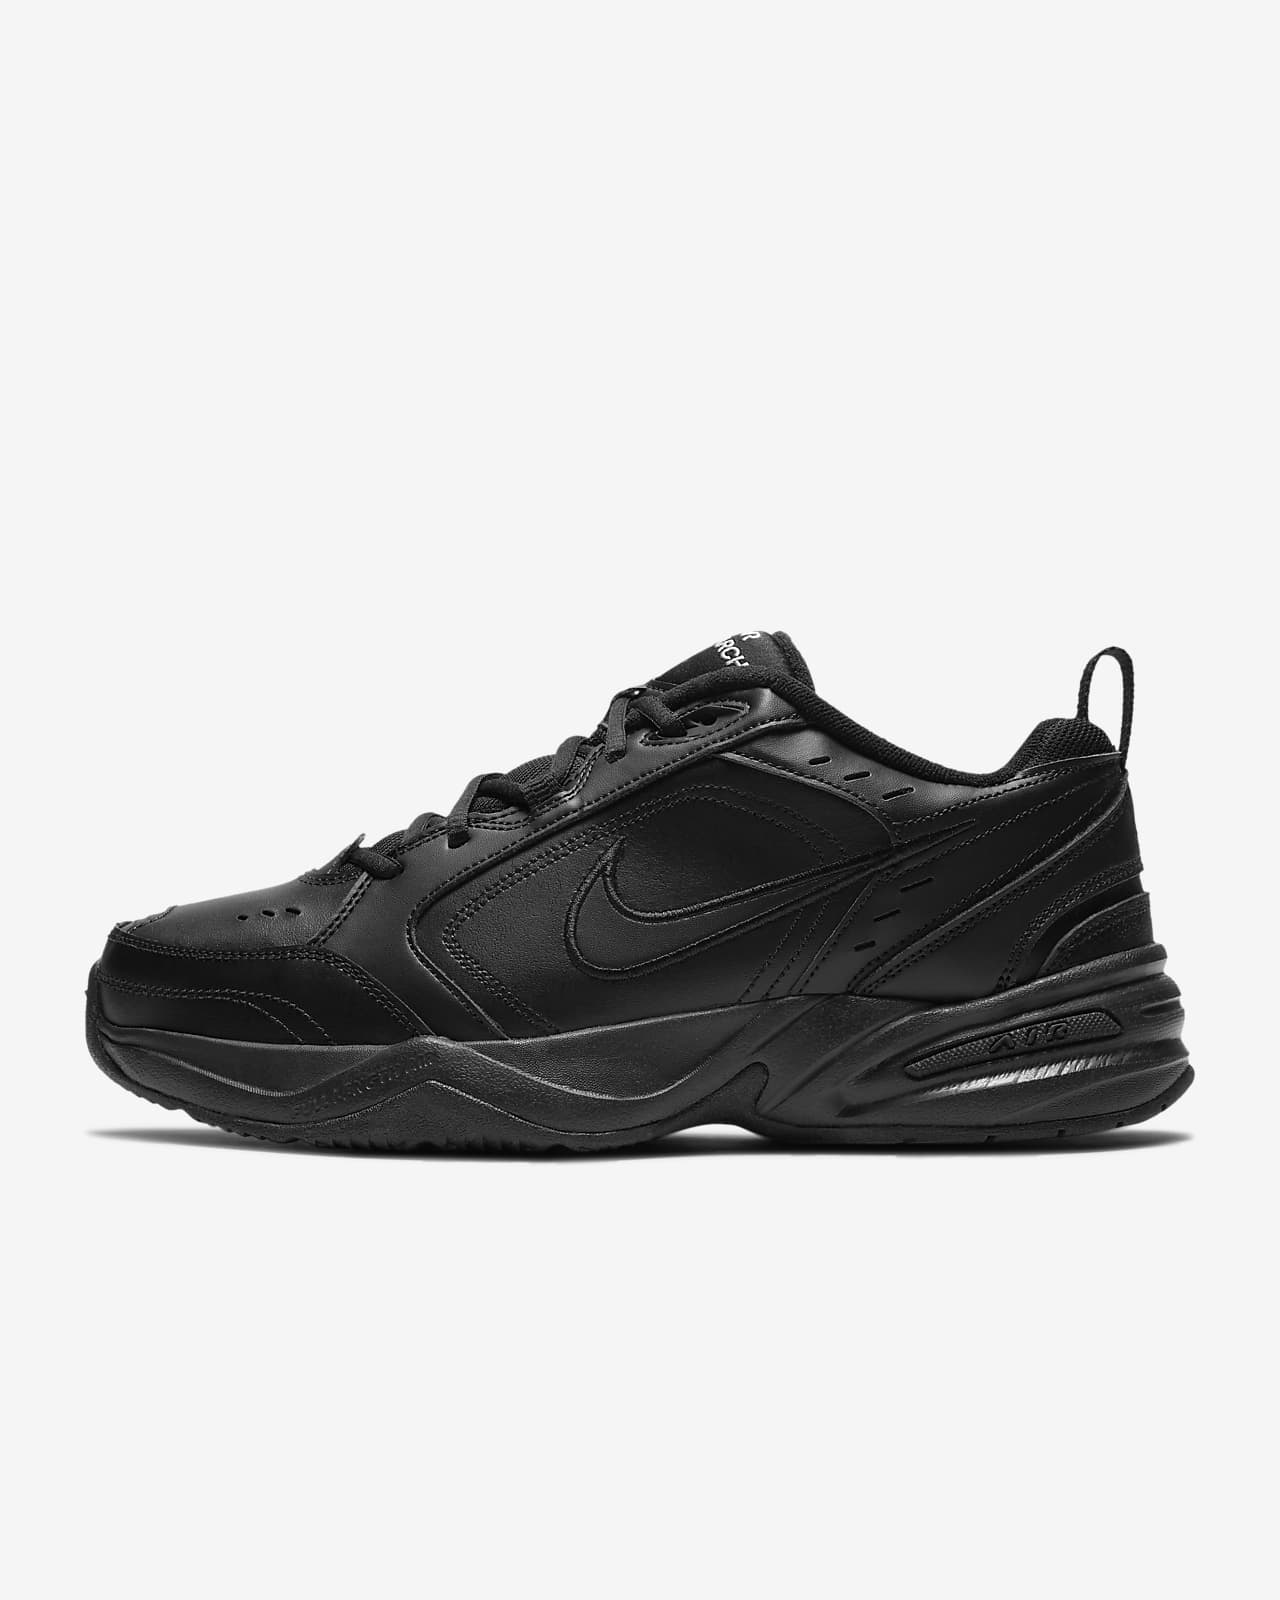 Męskie buty treningowe Nike Air Monarch IV